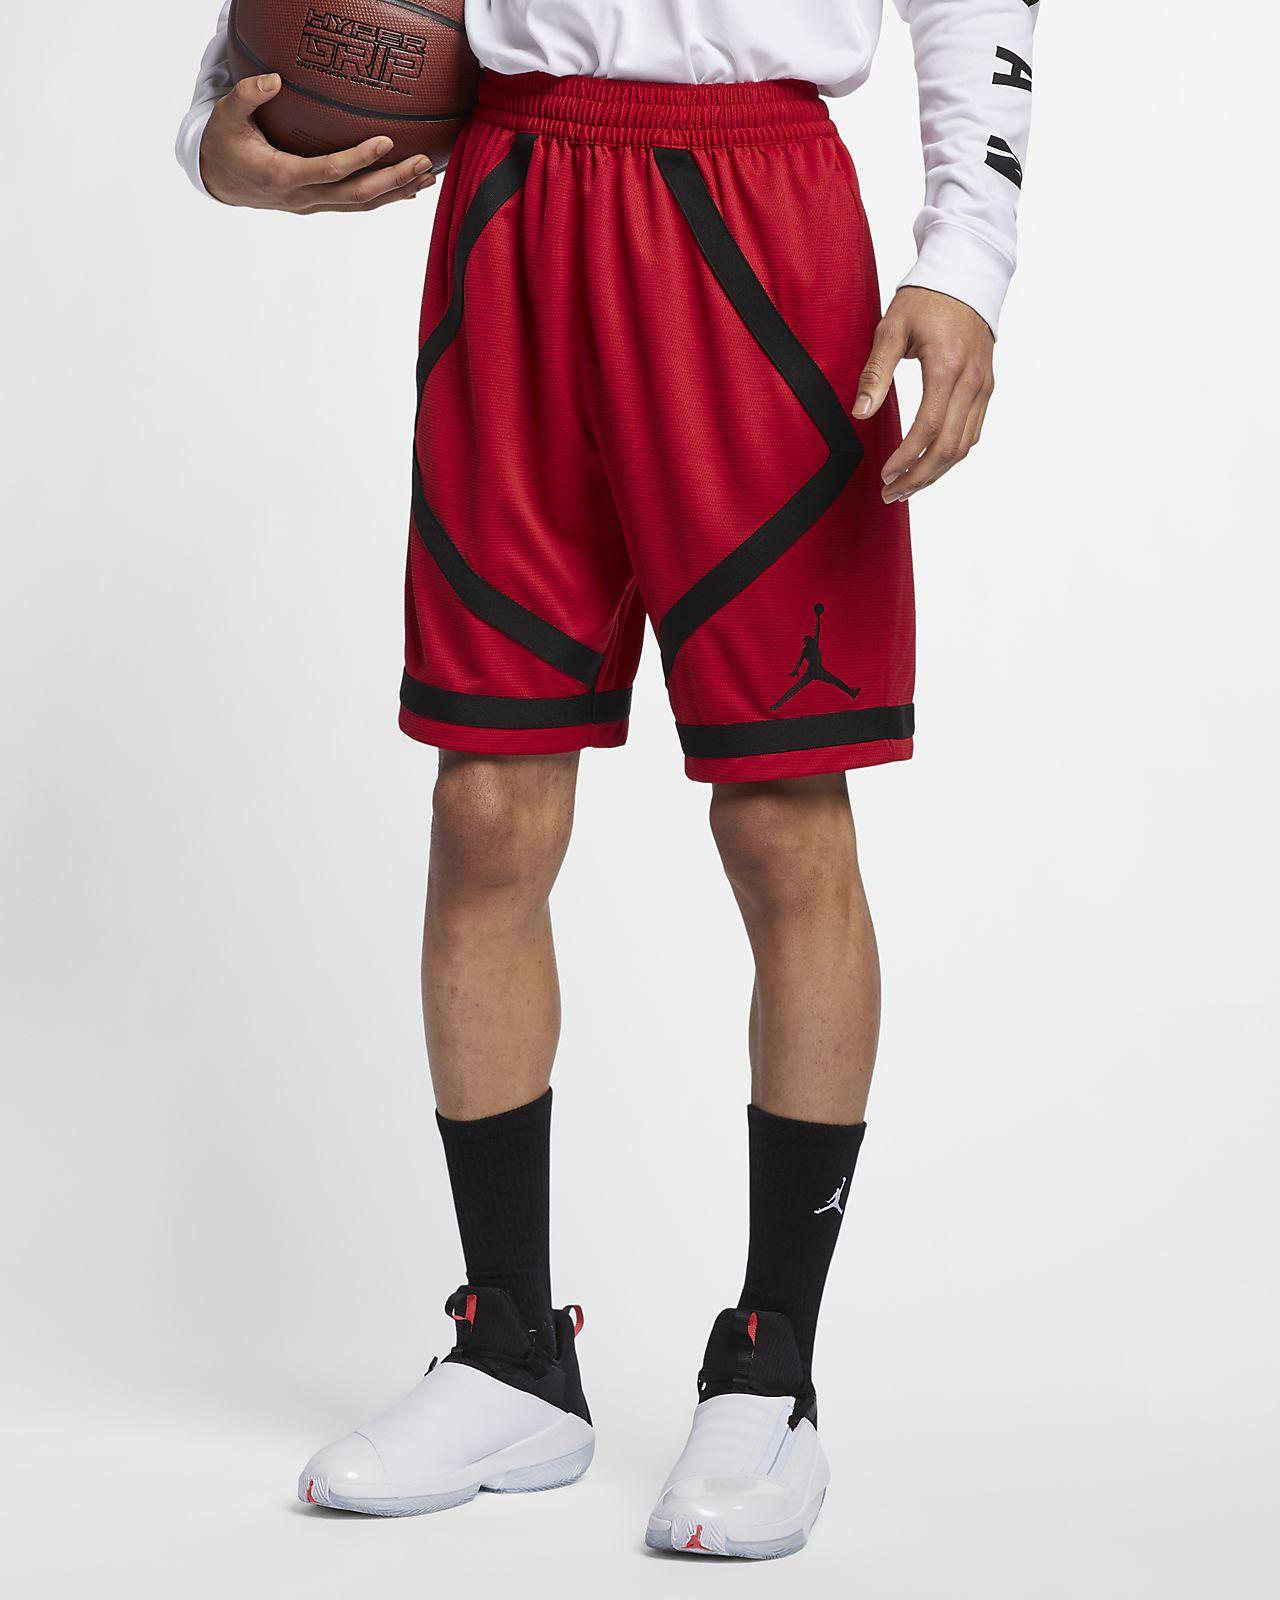 Jordan Dri-FIT 男款貼條籃球褲